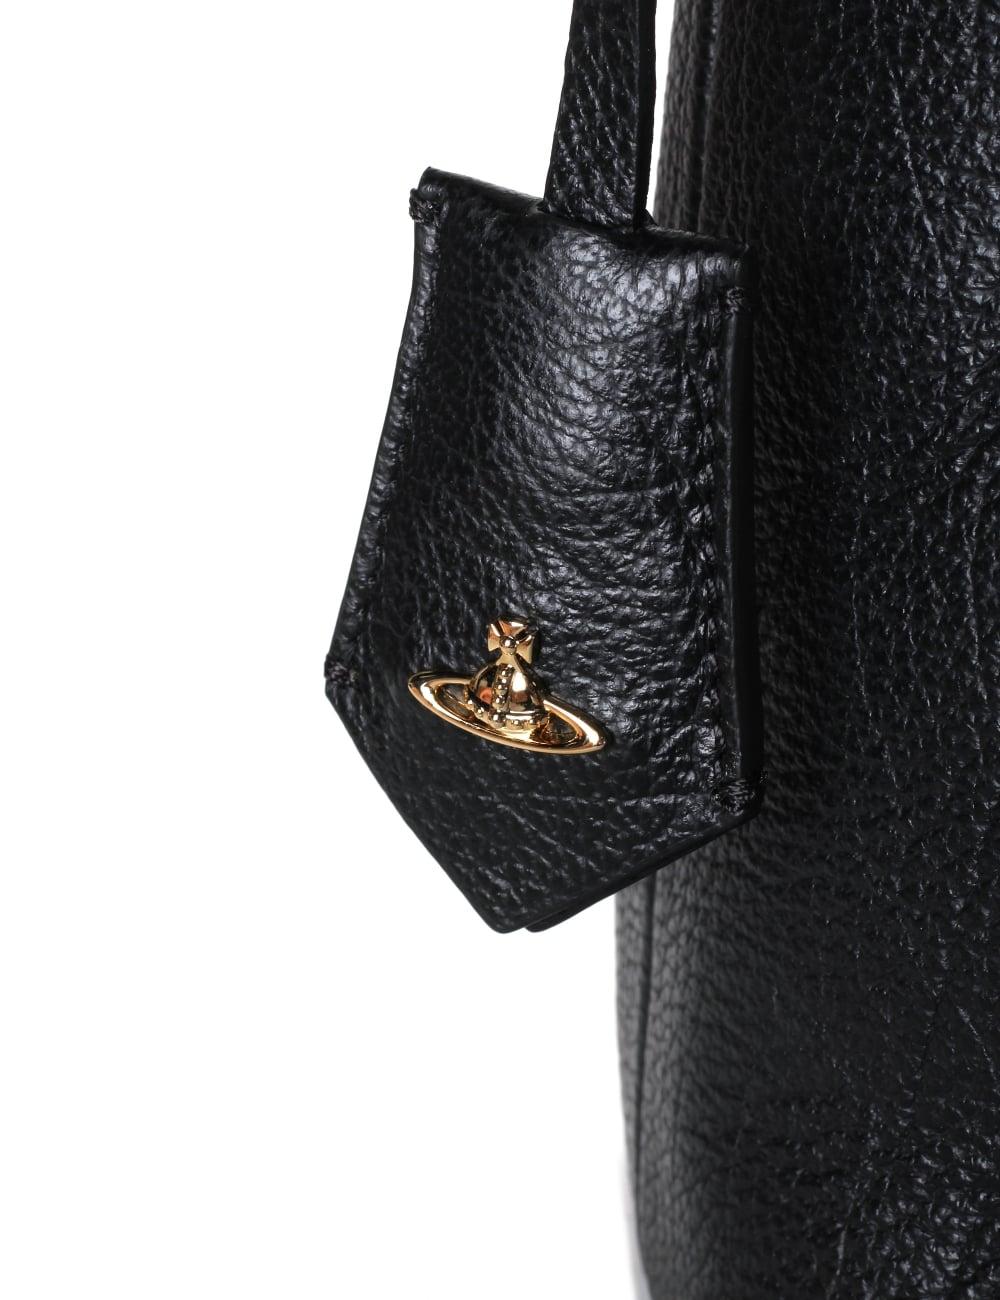 ac7acf49dfca Vivienne Westwood Women s Balmoral Hobo Bag